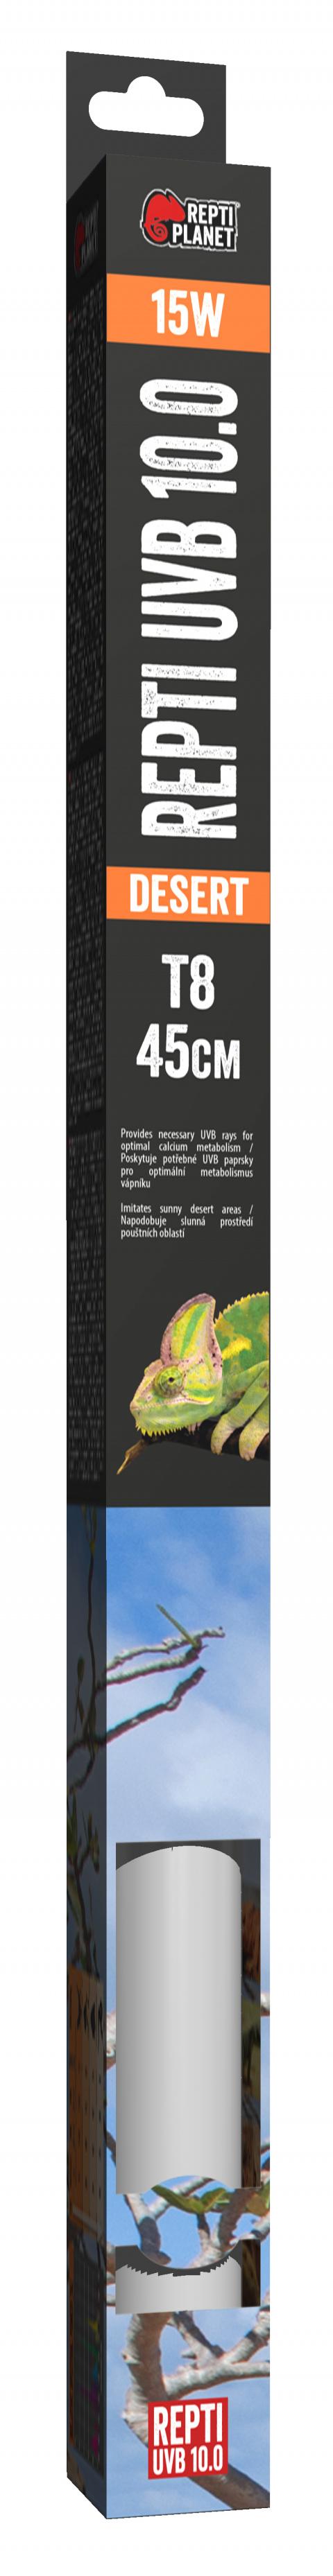 Лампа для террариумов - ReptiPlanet Repti T8 UVB 10.0 15W, 45 см title=